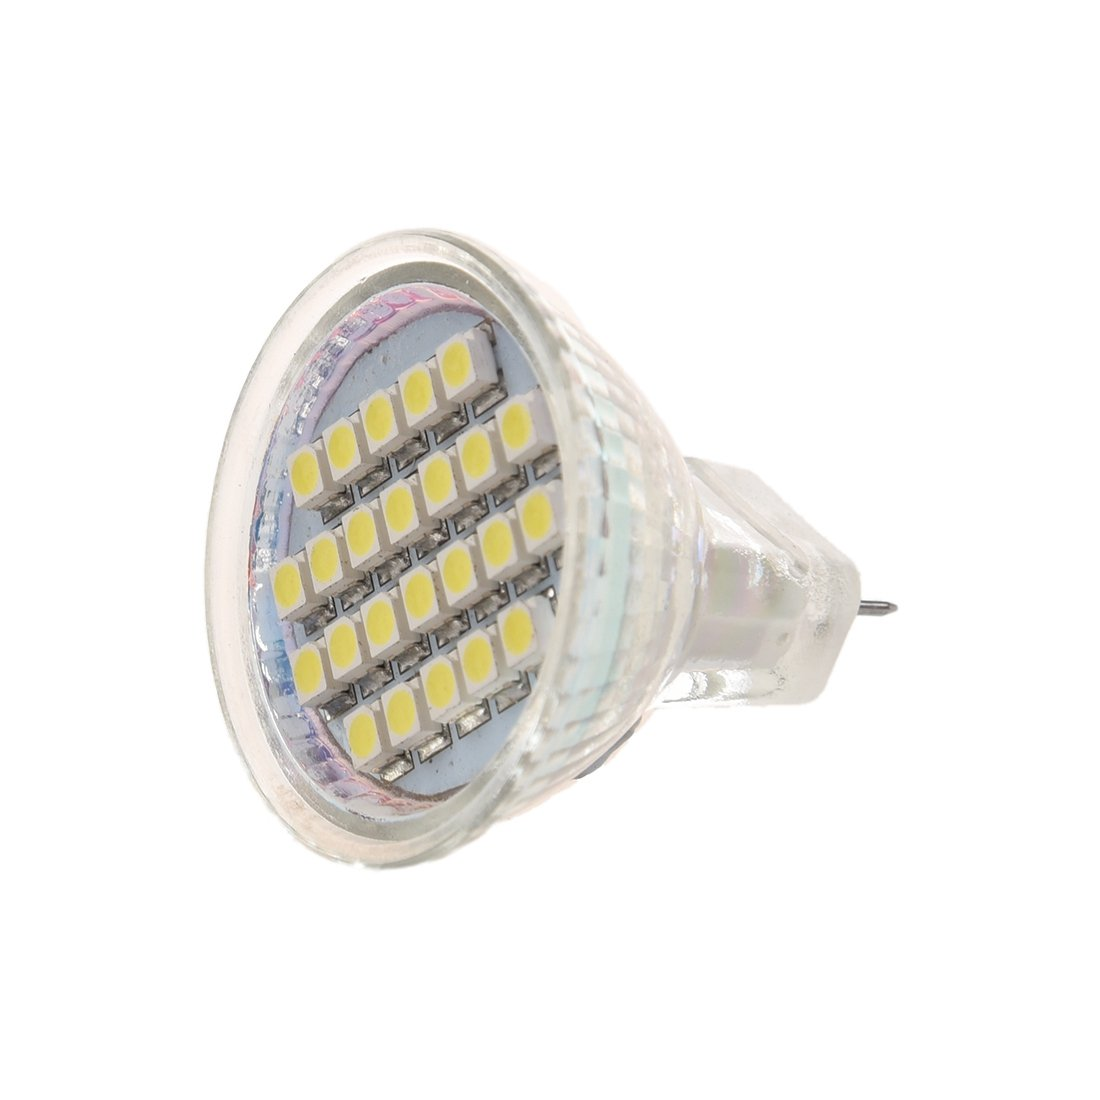 TOOGOO(R)1.5W AC12V MR11 GU4 72-96LM LED Bulb 24 LED 3528 1210 SMD White Lamp